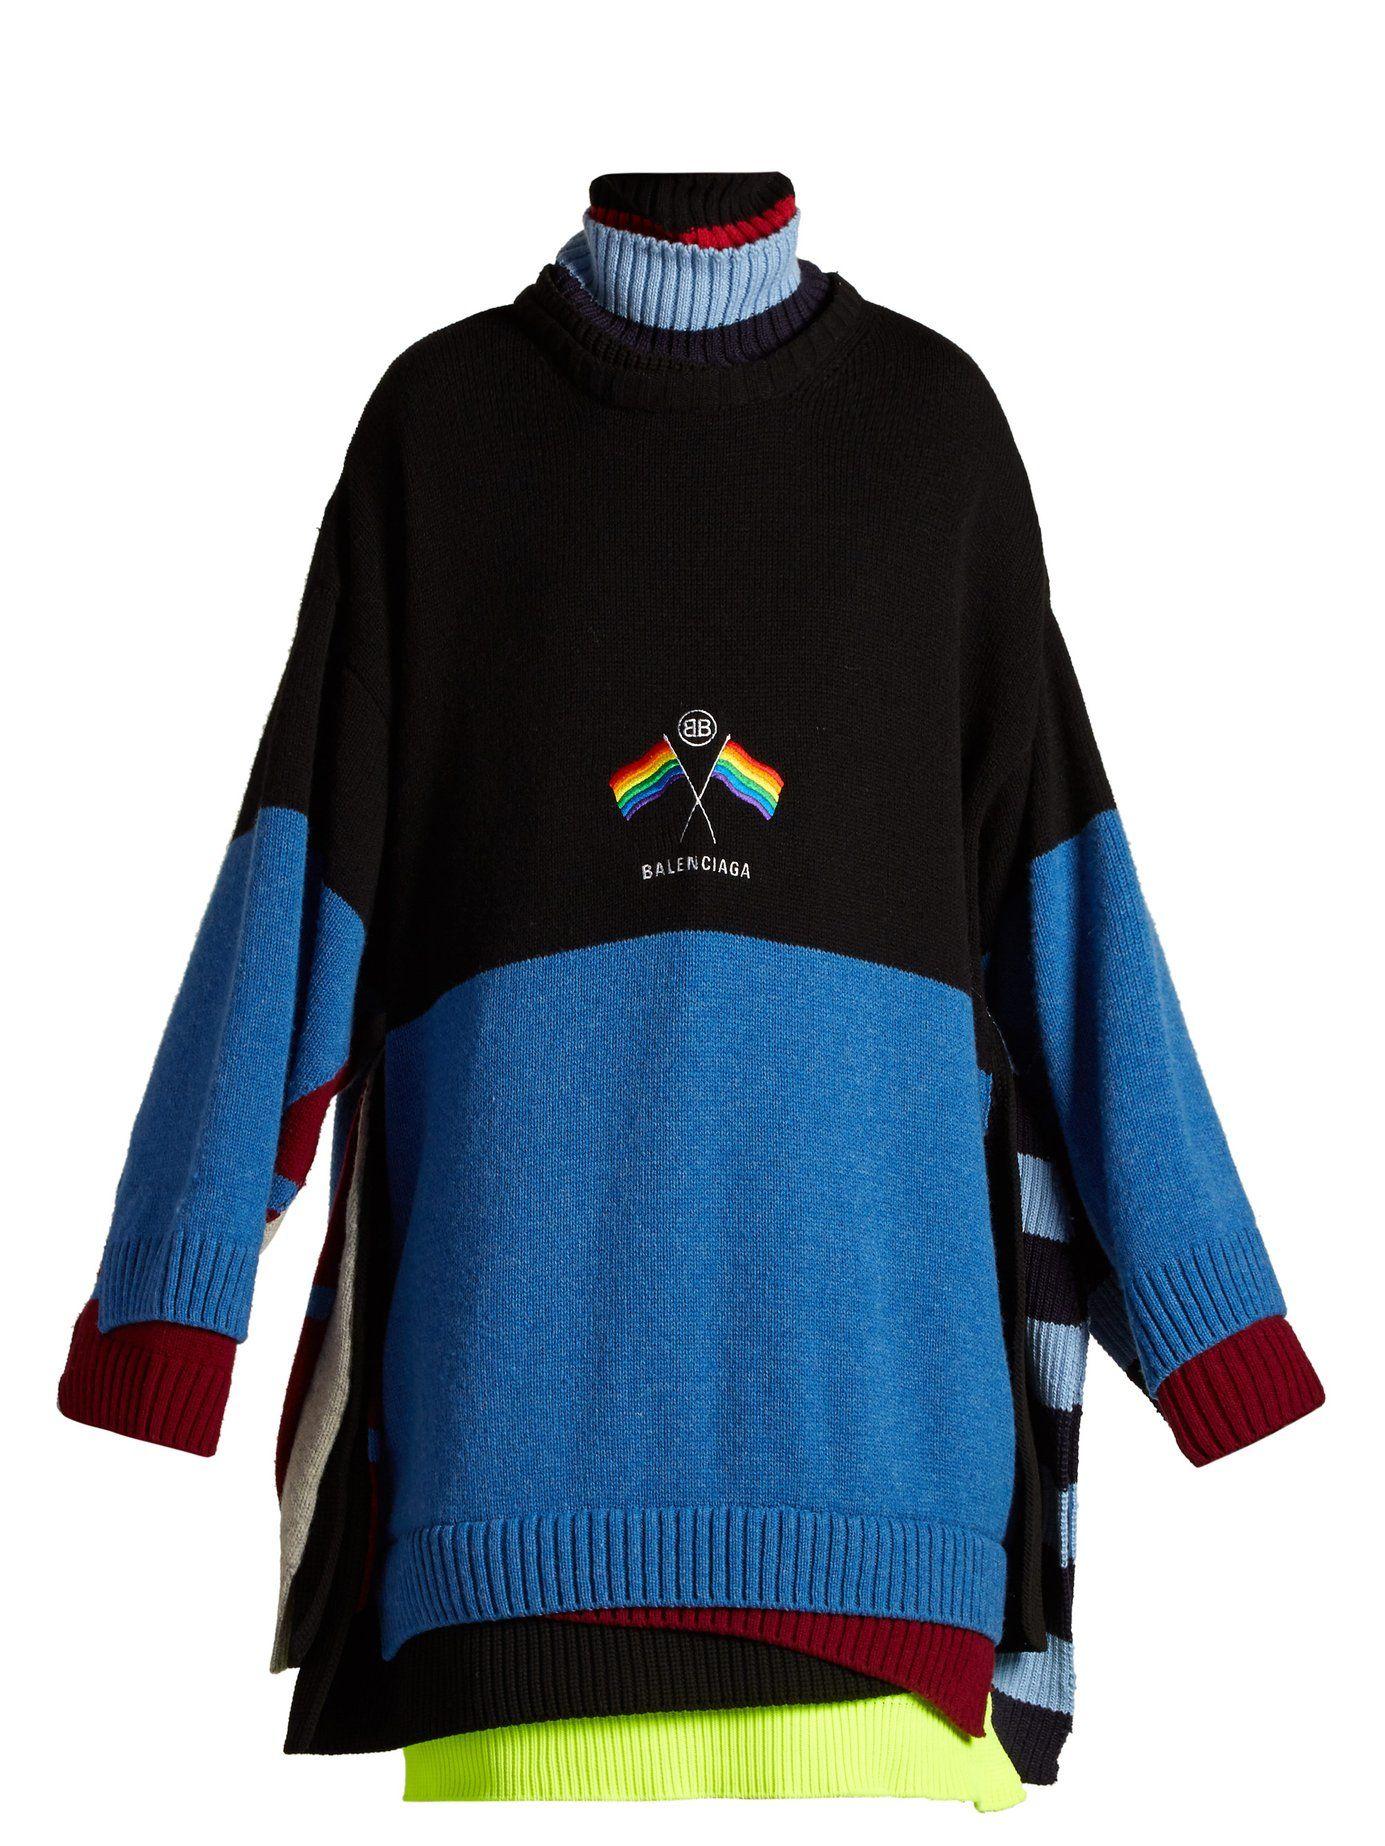 Logoembroidered layered sweater Balenciaga